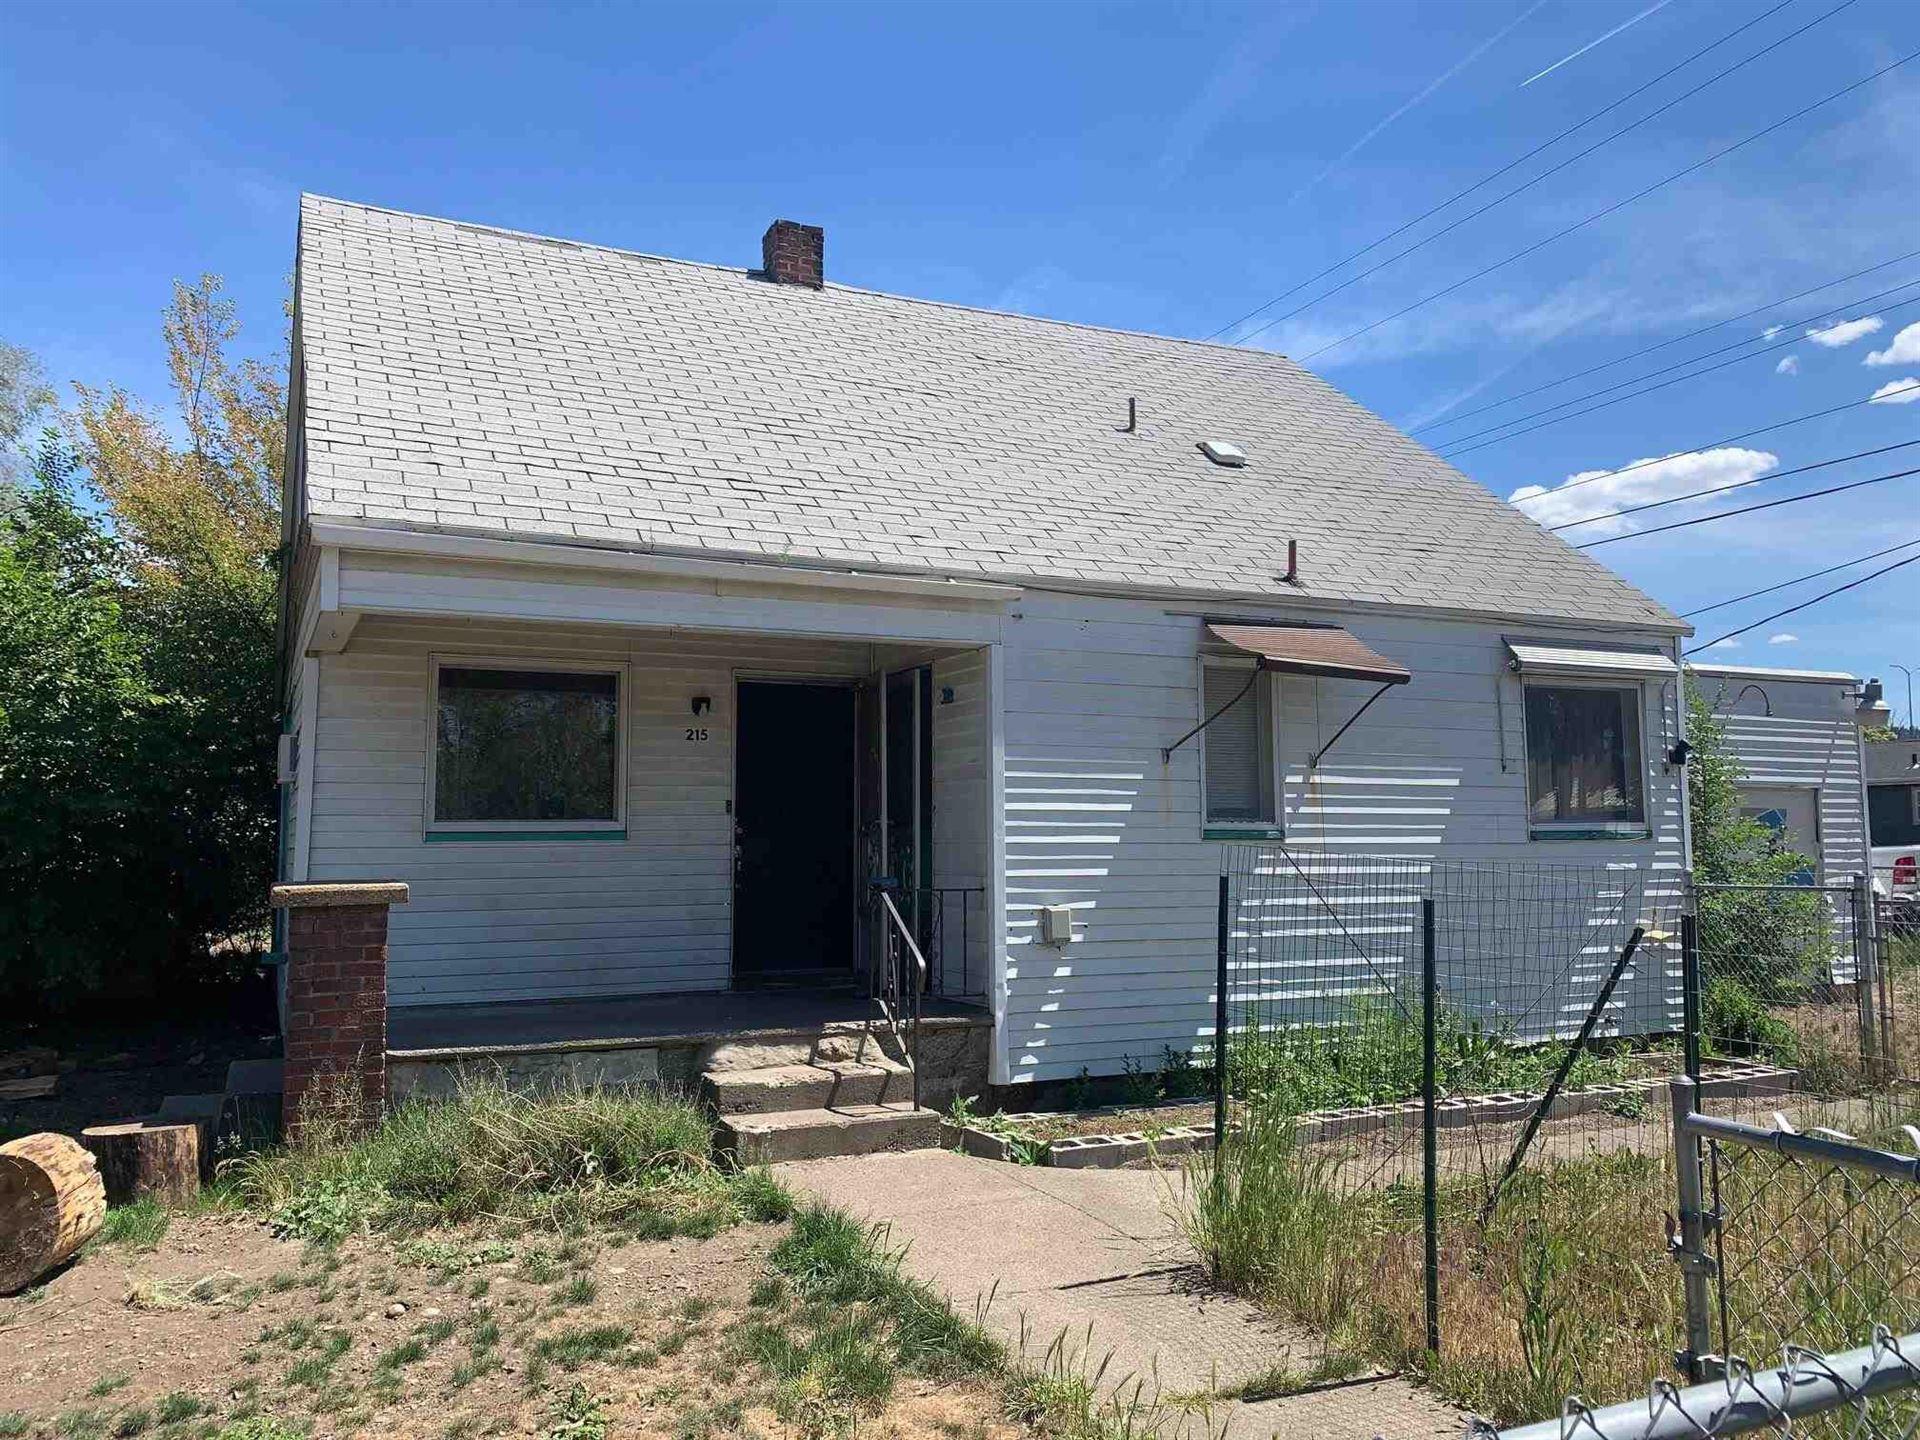 215 S Custer Rd, Spokane Valley, WA 99212 - #: 202116532